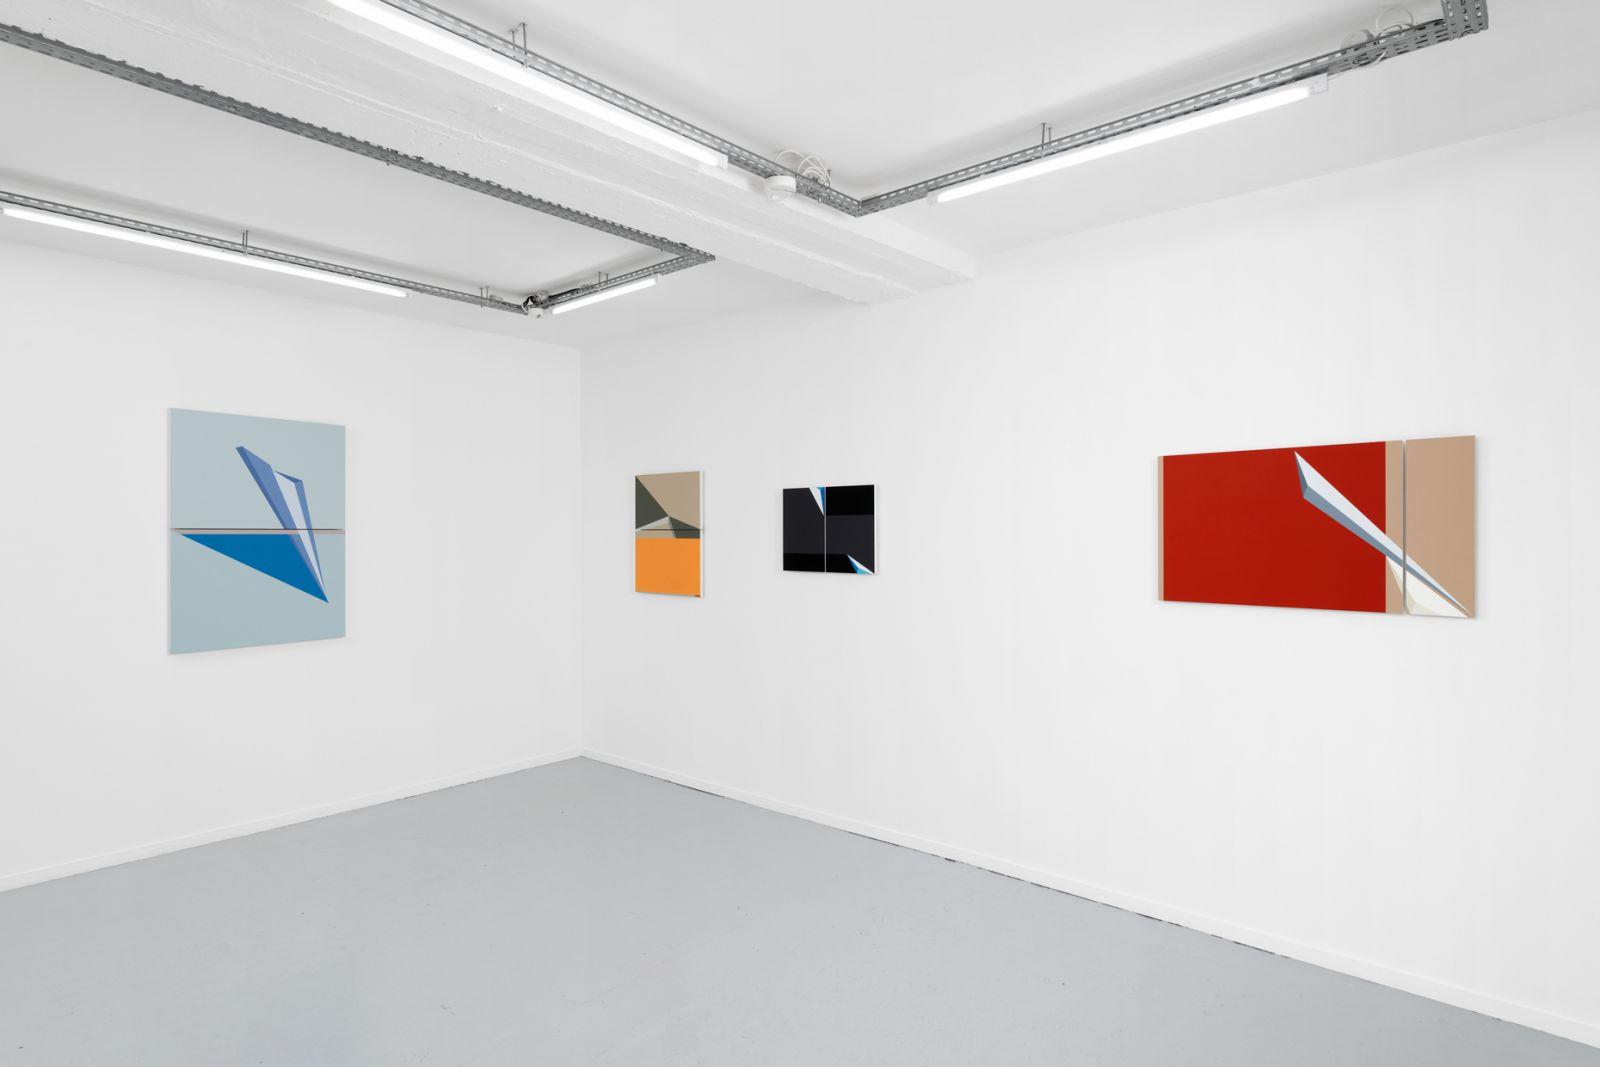 03-parties-fines-progress-gallery-vue-expo-4-aurelien-mole-web-15bd204864f05b595fc1bb033f3ab0dd